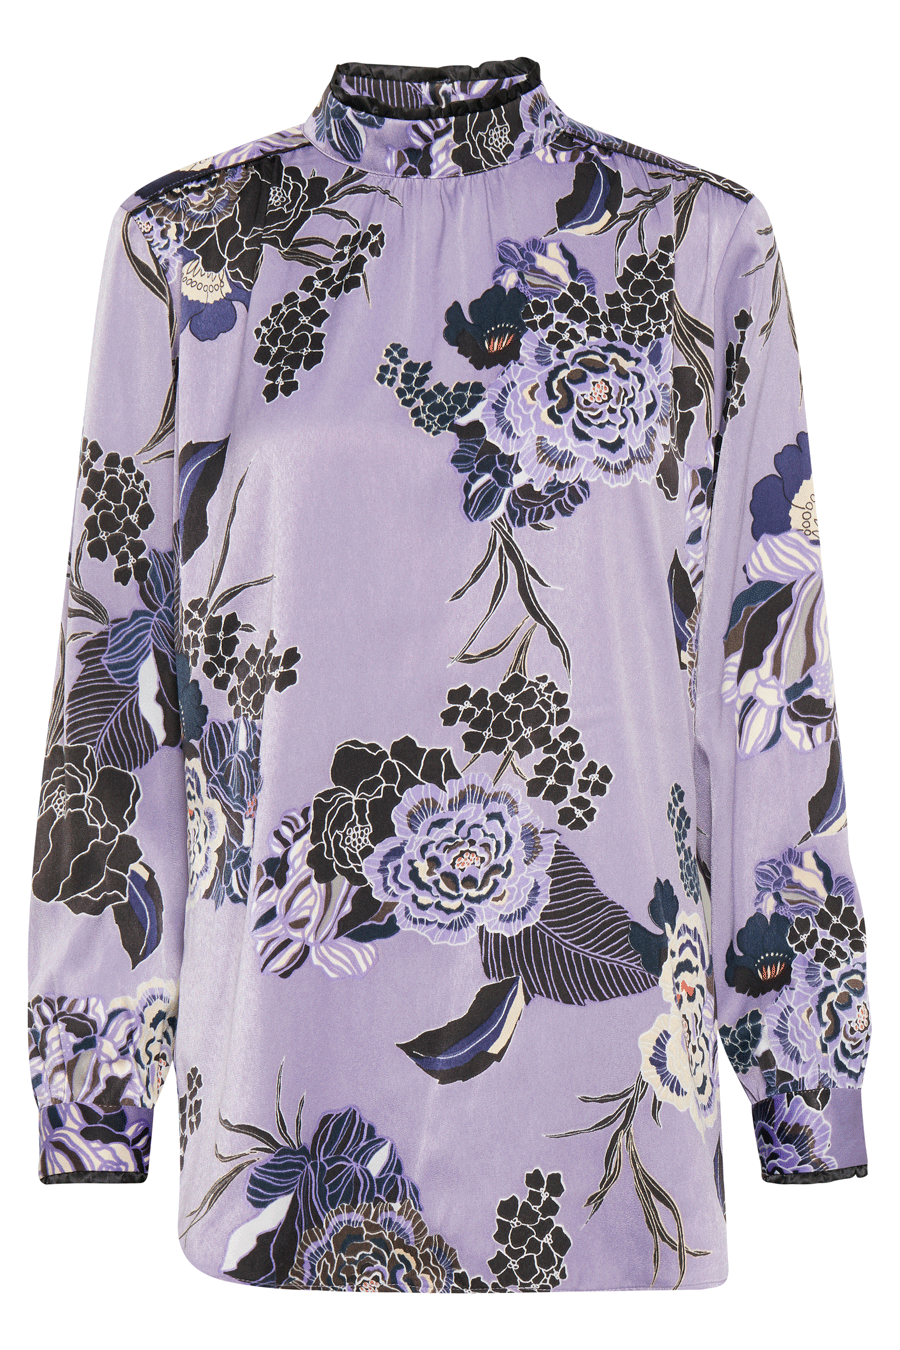 Pulz Addi L/S Blouse, blomstret bluse, lilla